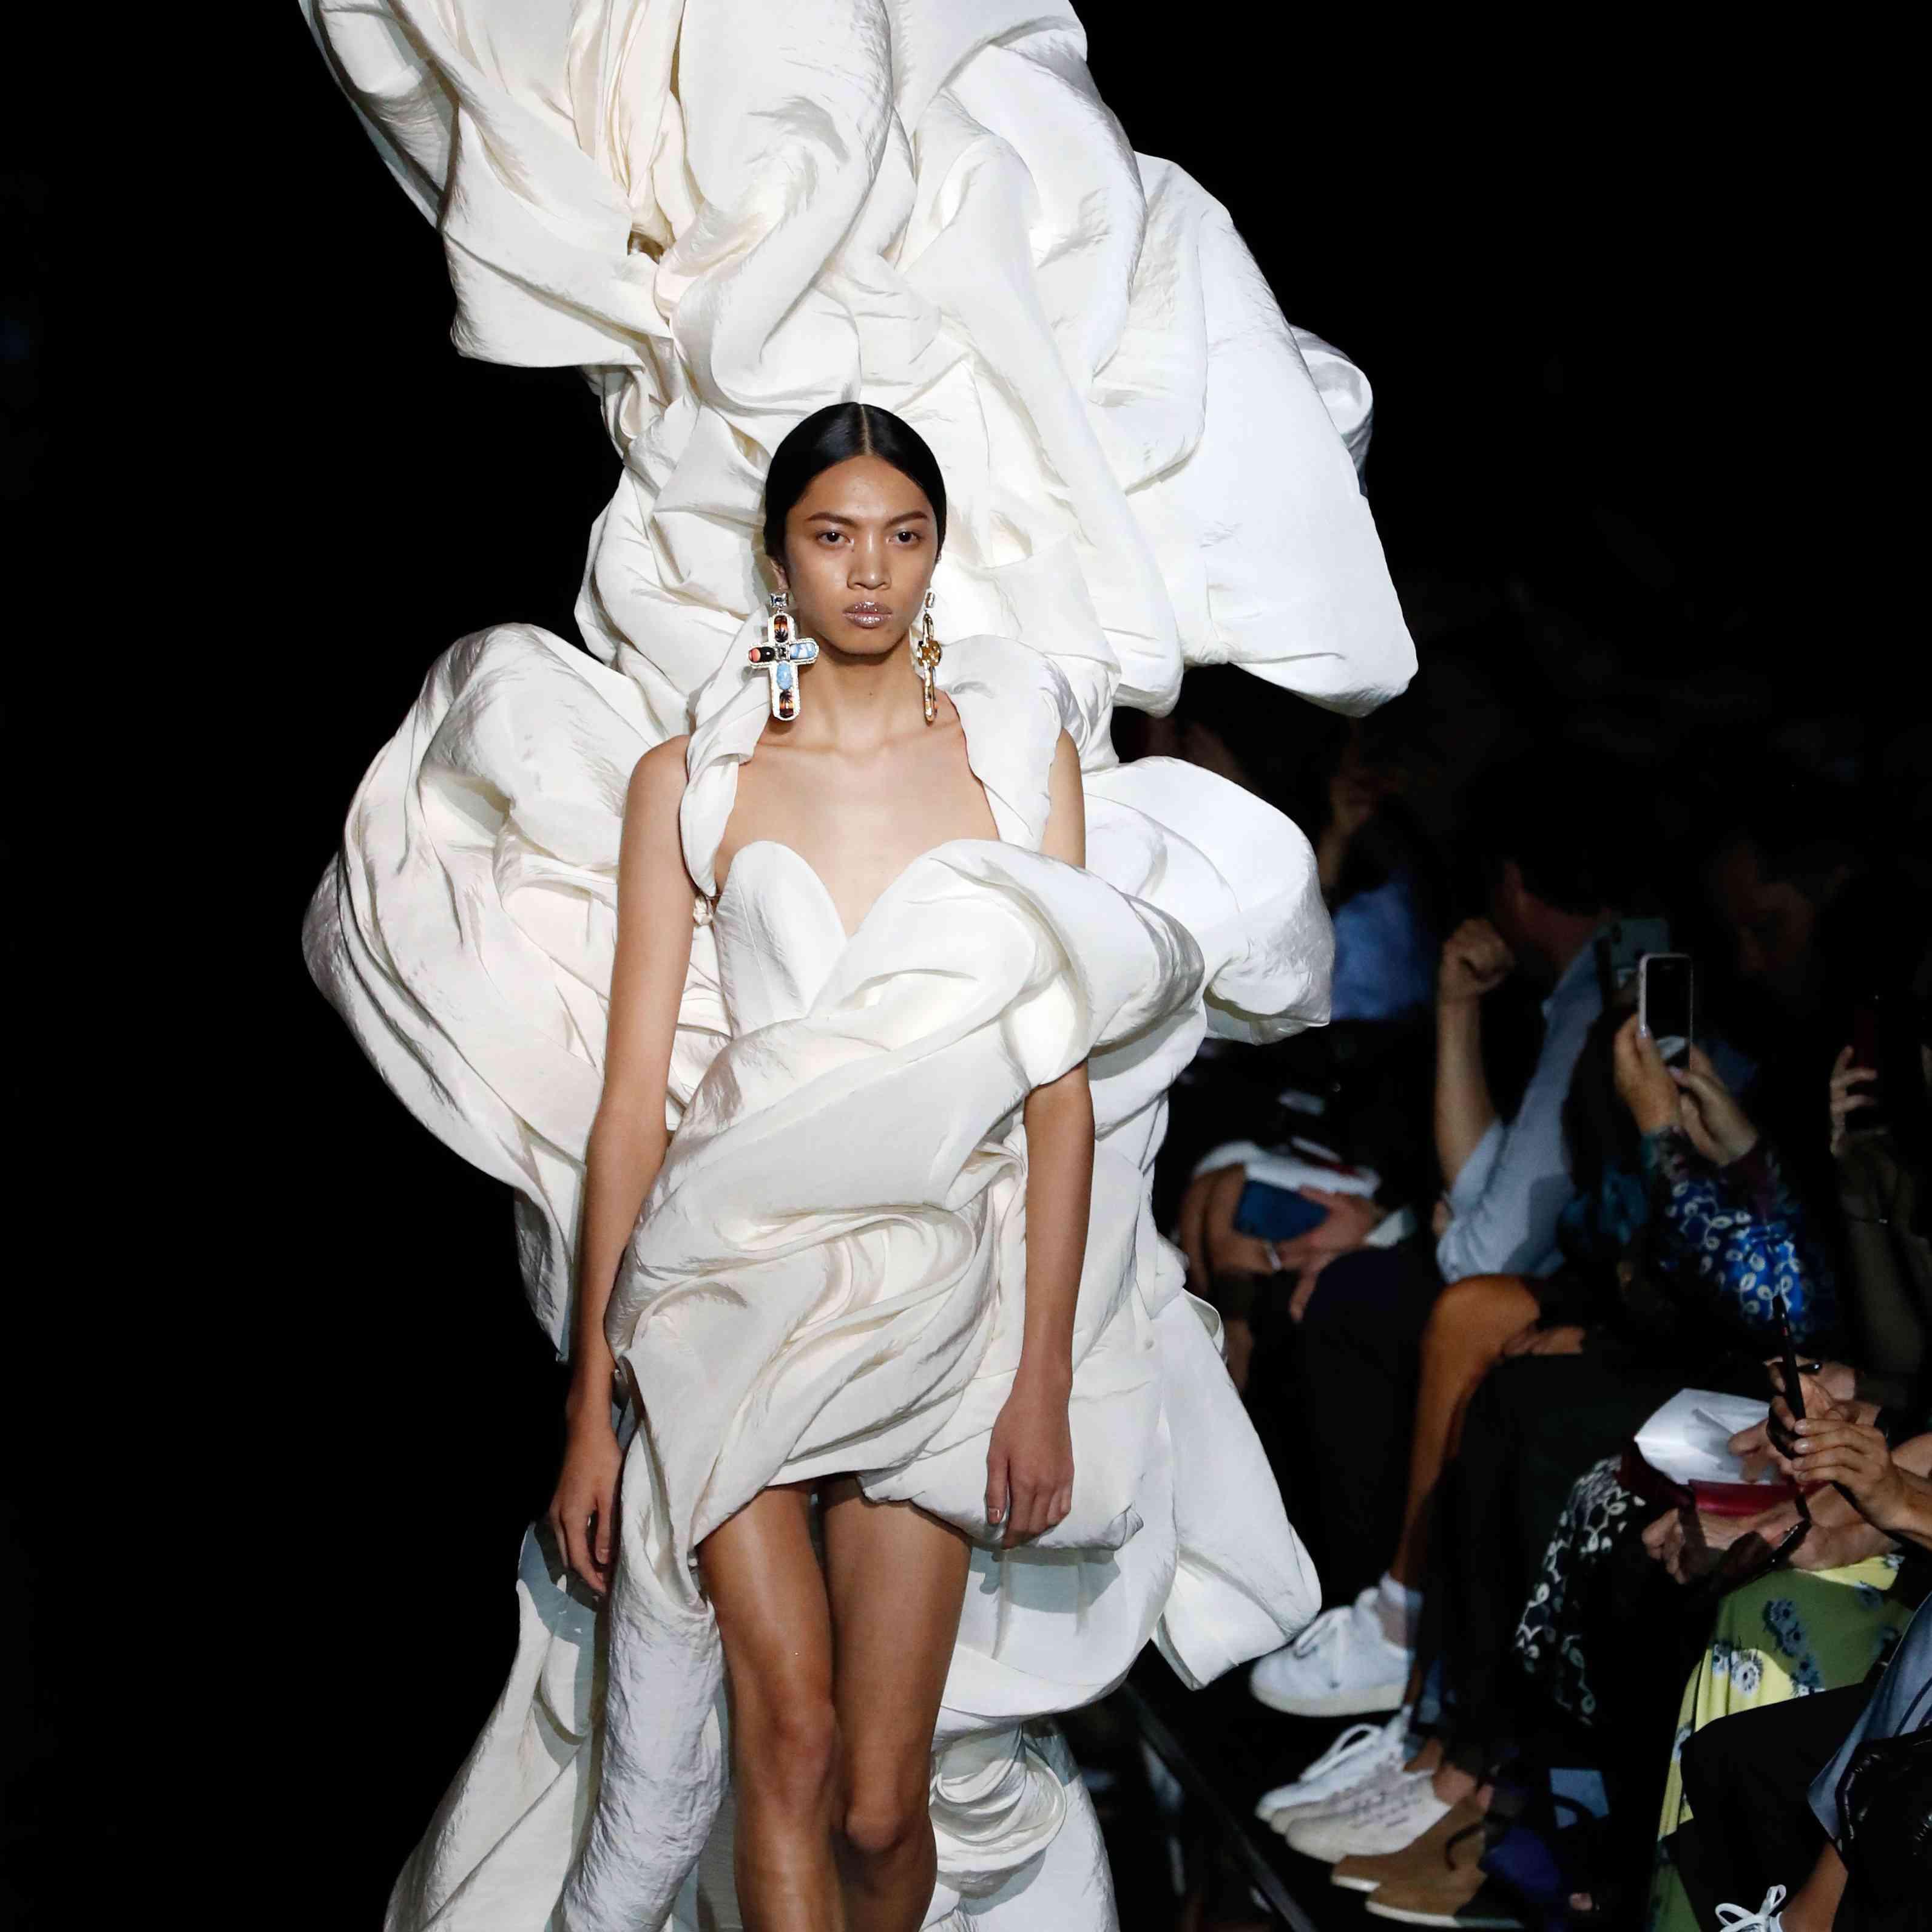 Model walking runway in large white gown